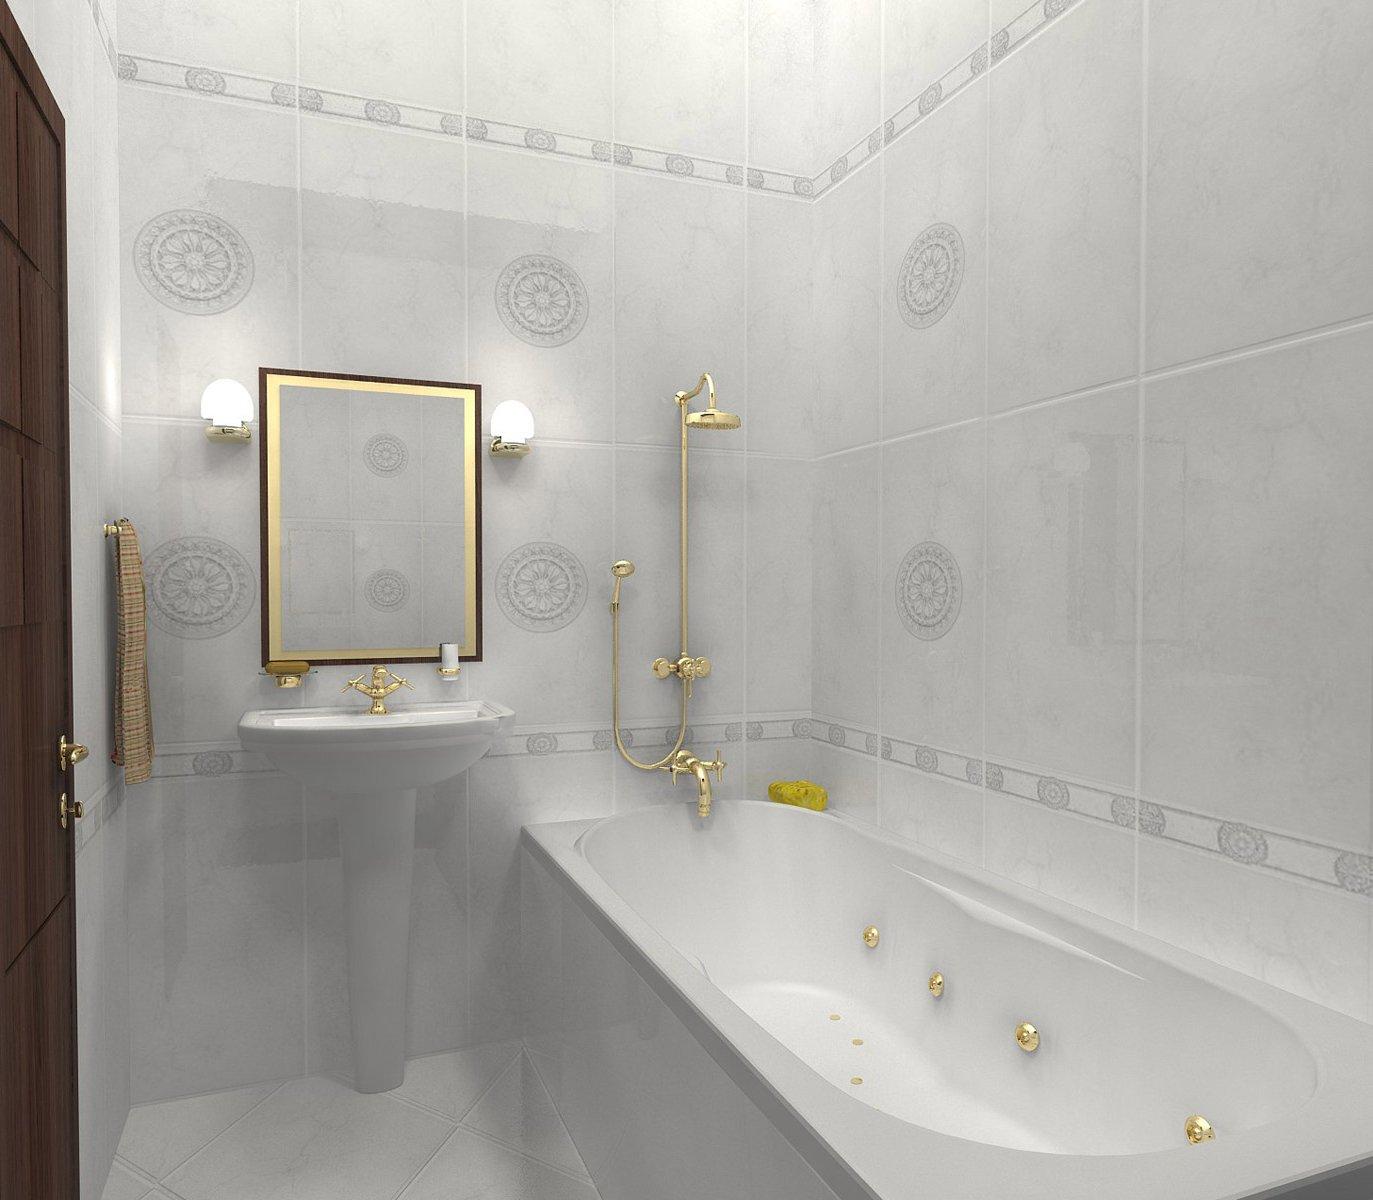 Дизайн отделки ванных комнат плиткой фото